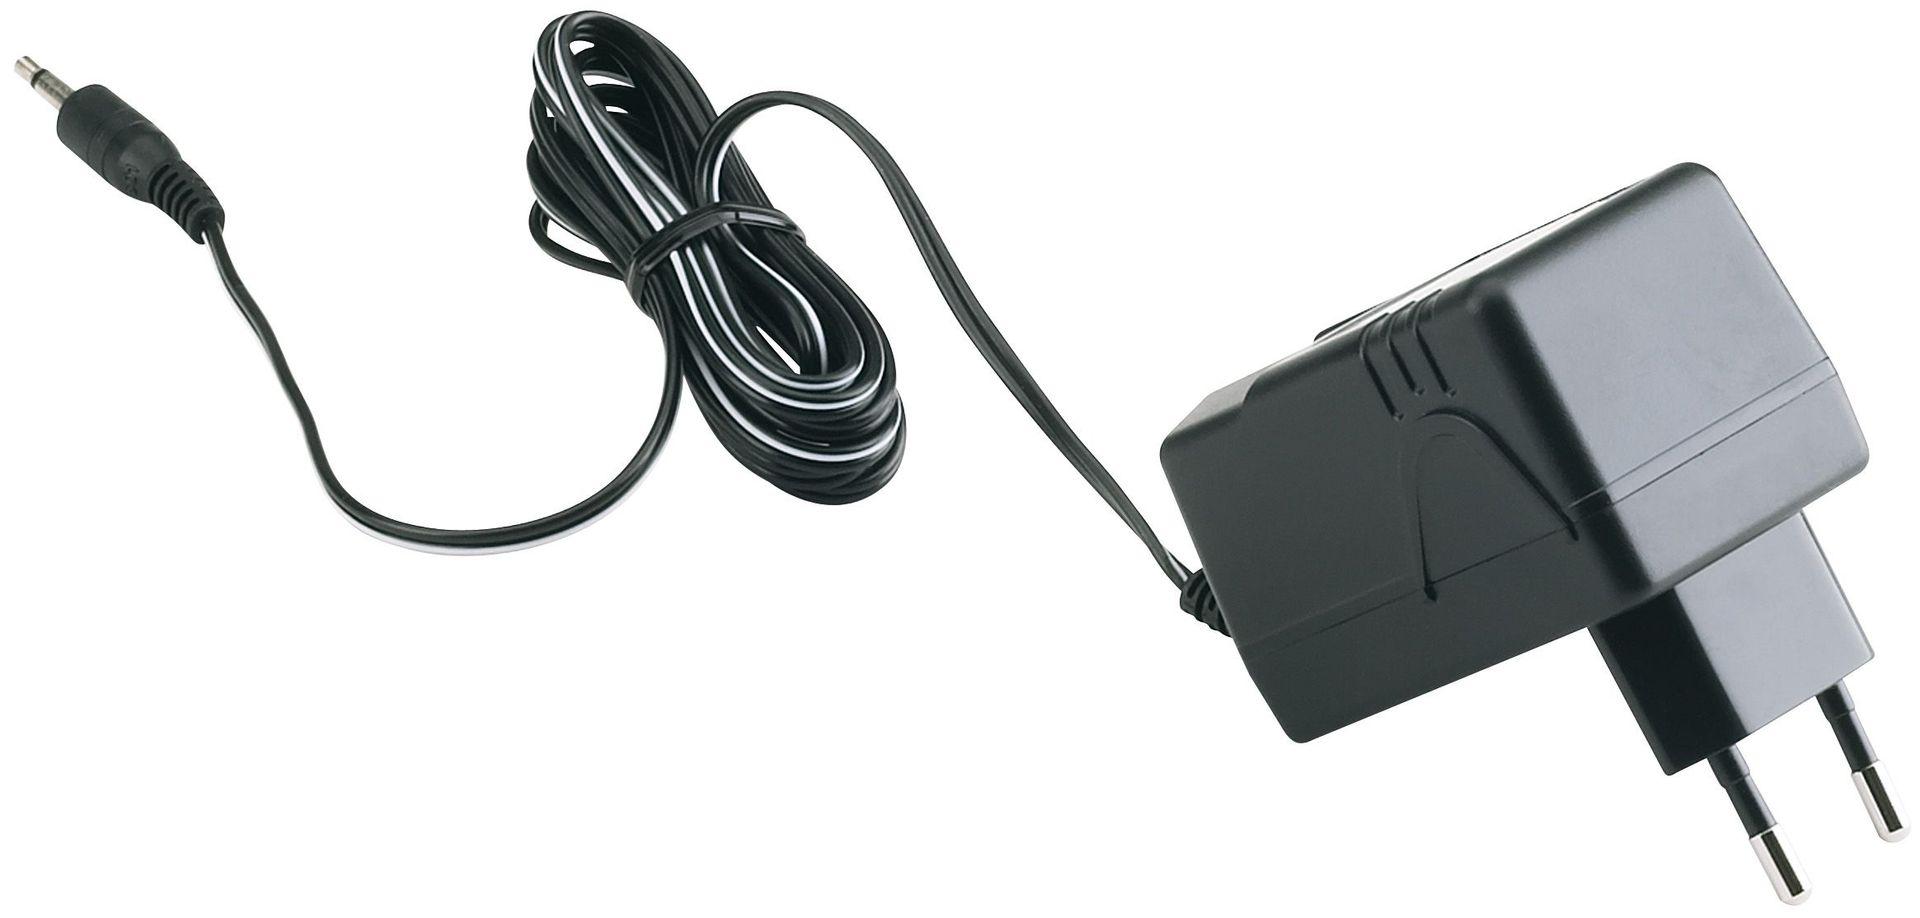 K&M 12231 Netzadapter Starlight-M für Starlight Mini 12230